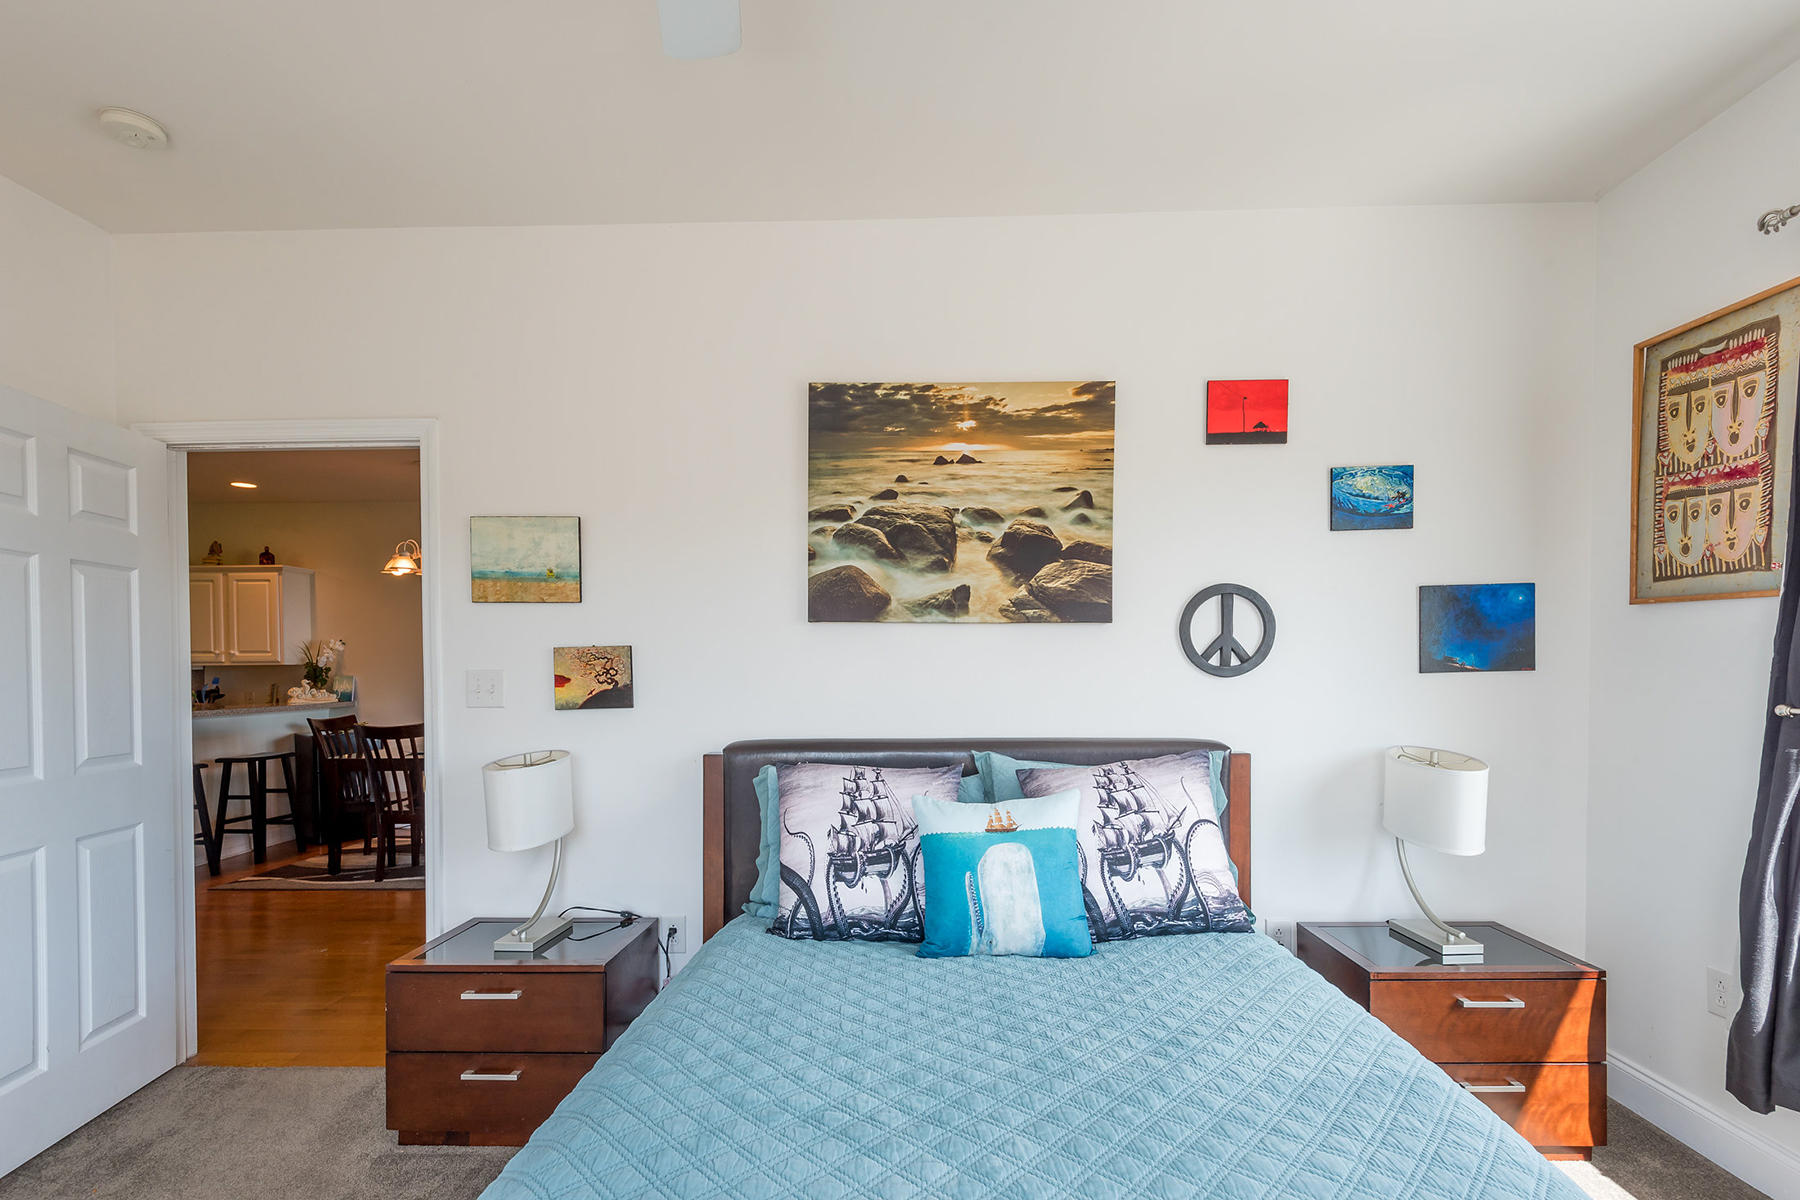 Pier Pointe Villas Homes For Sale - 114 Ashley, Folly Beach, SC - 21